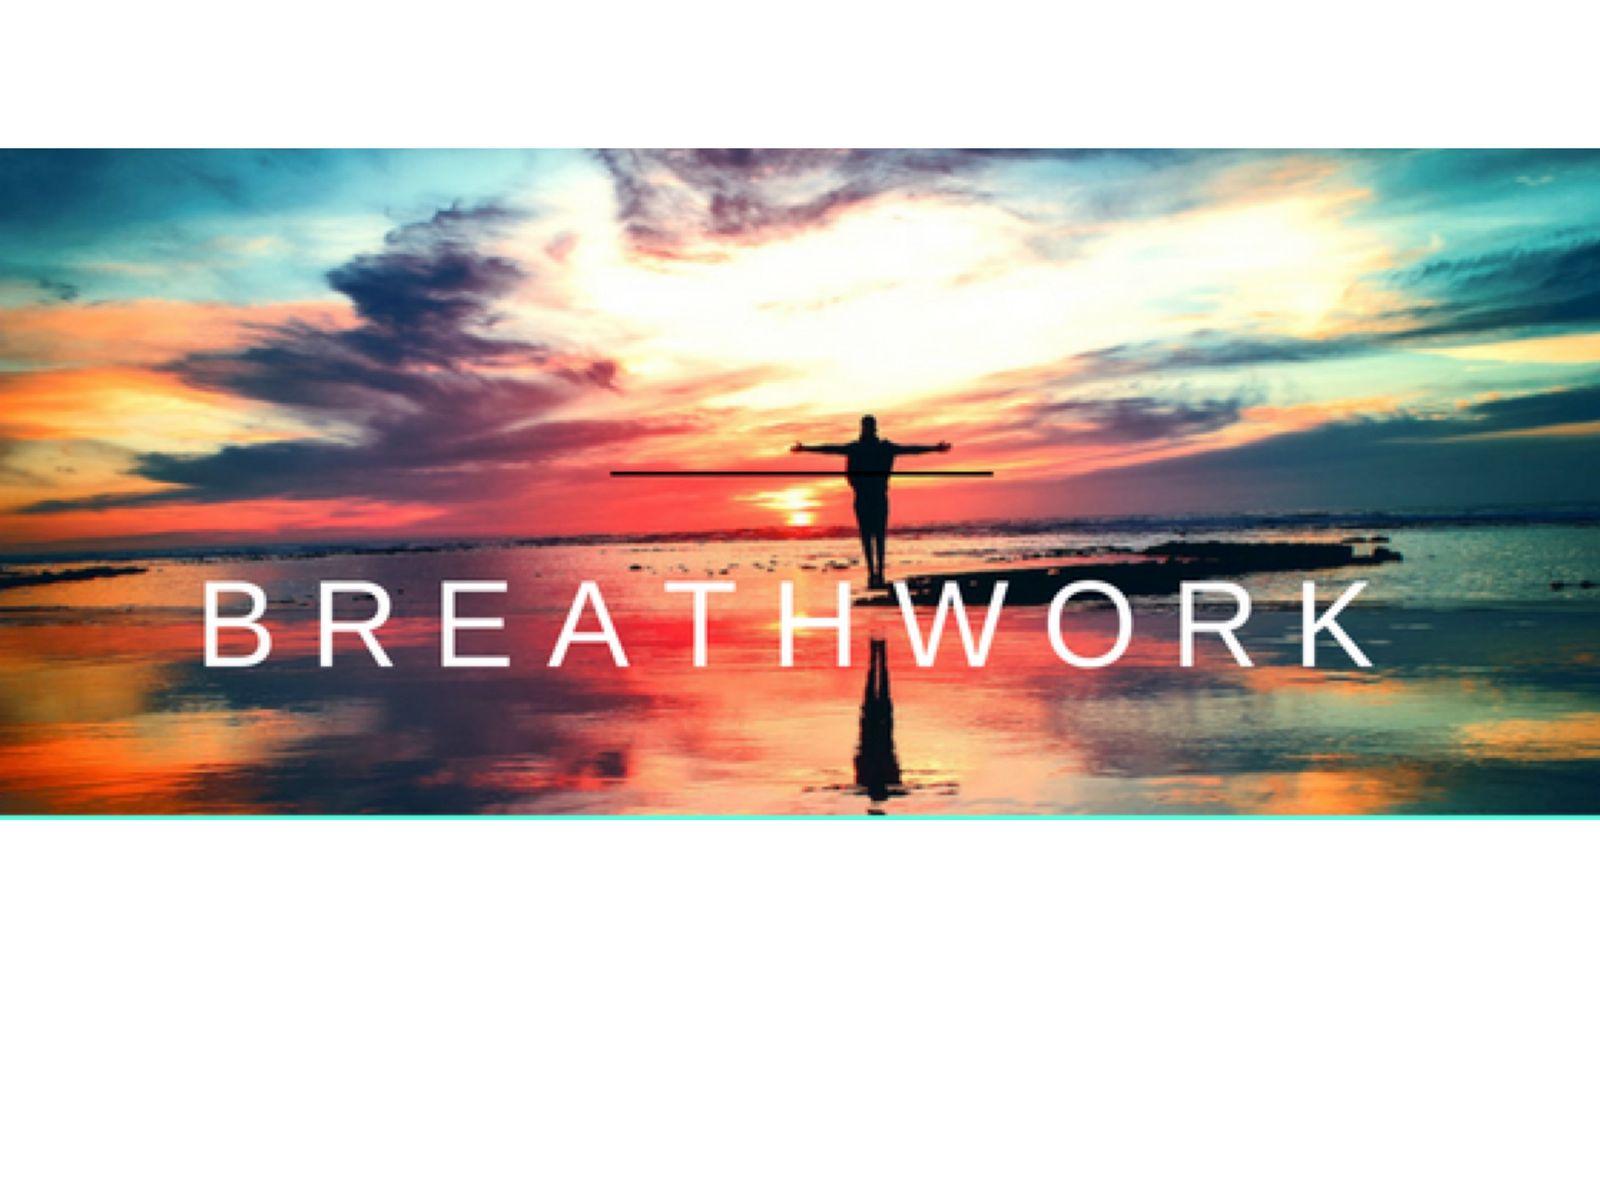 Breathwork Cropped.jpg